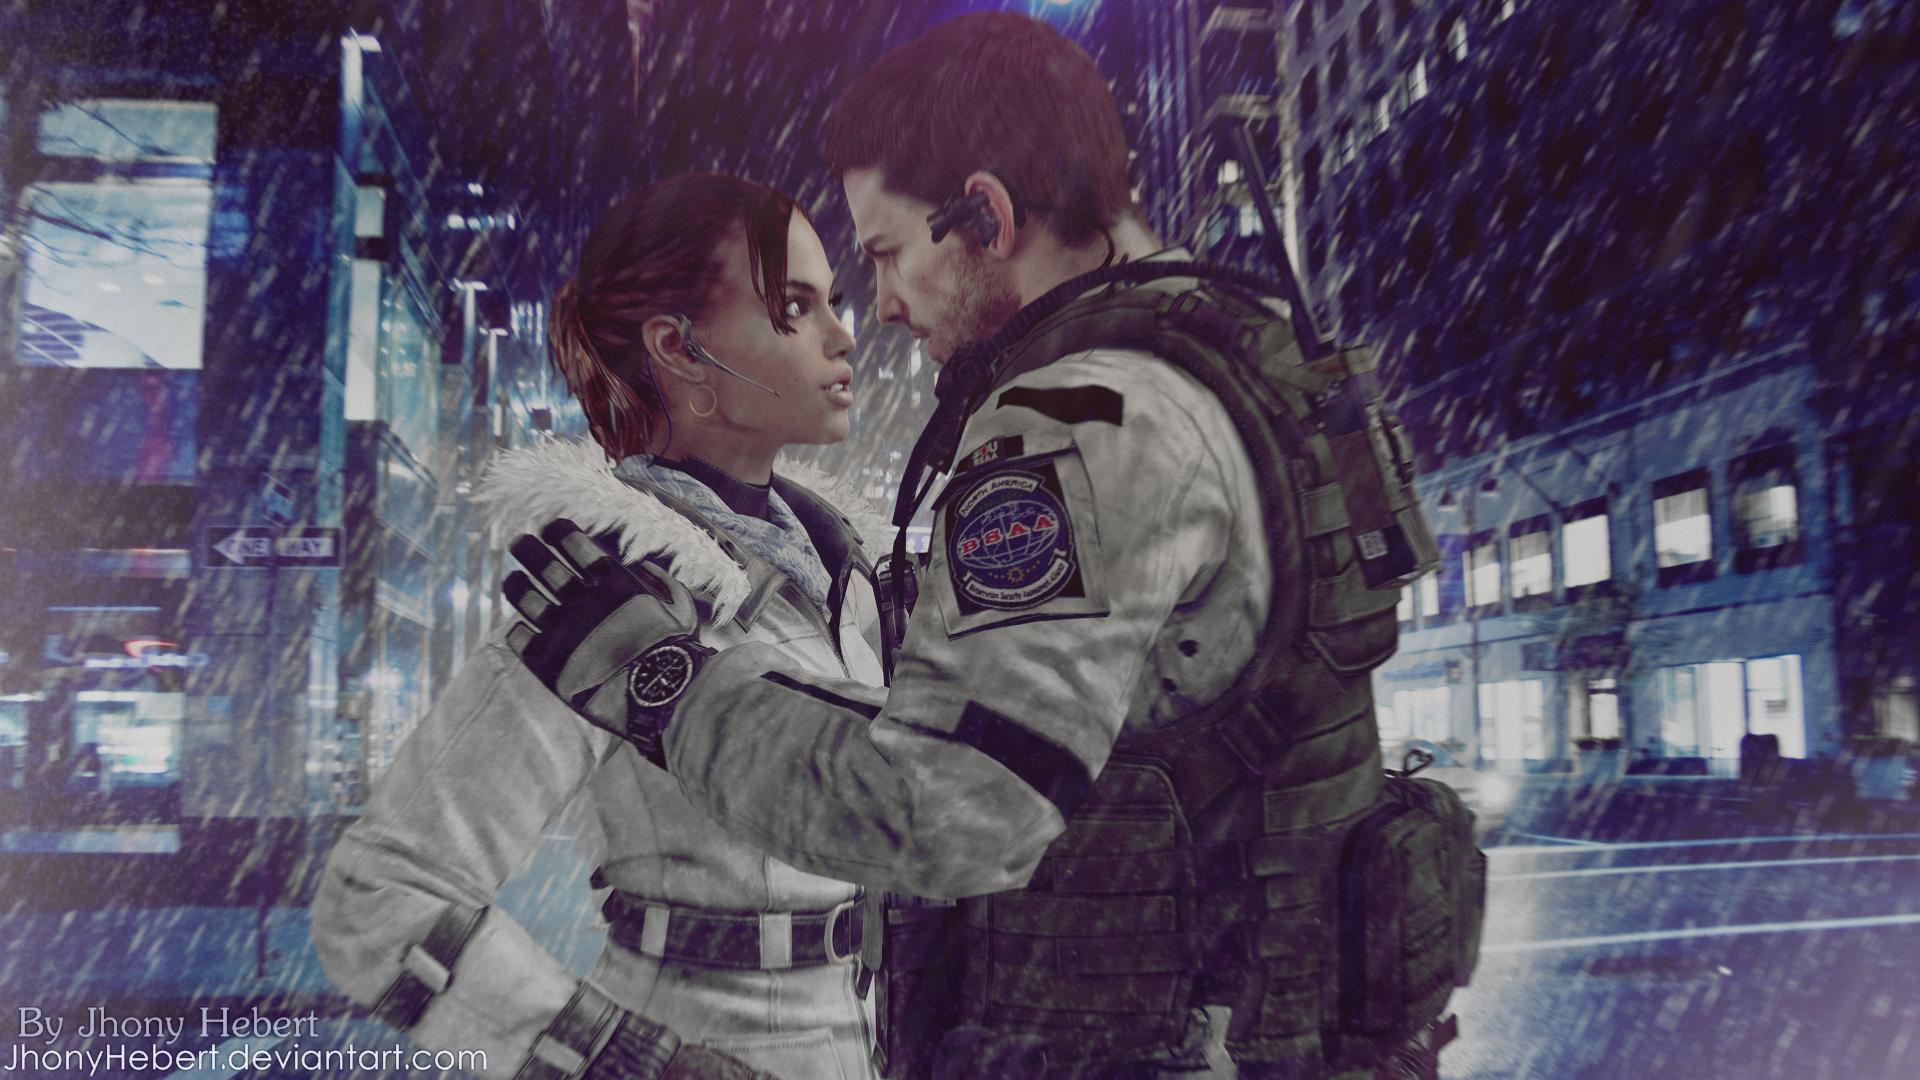 Chris and Sheva in the Rain by JhonyHebert